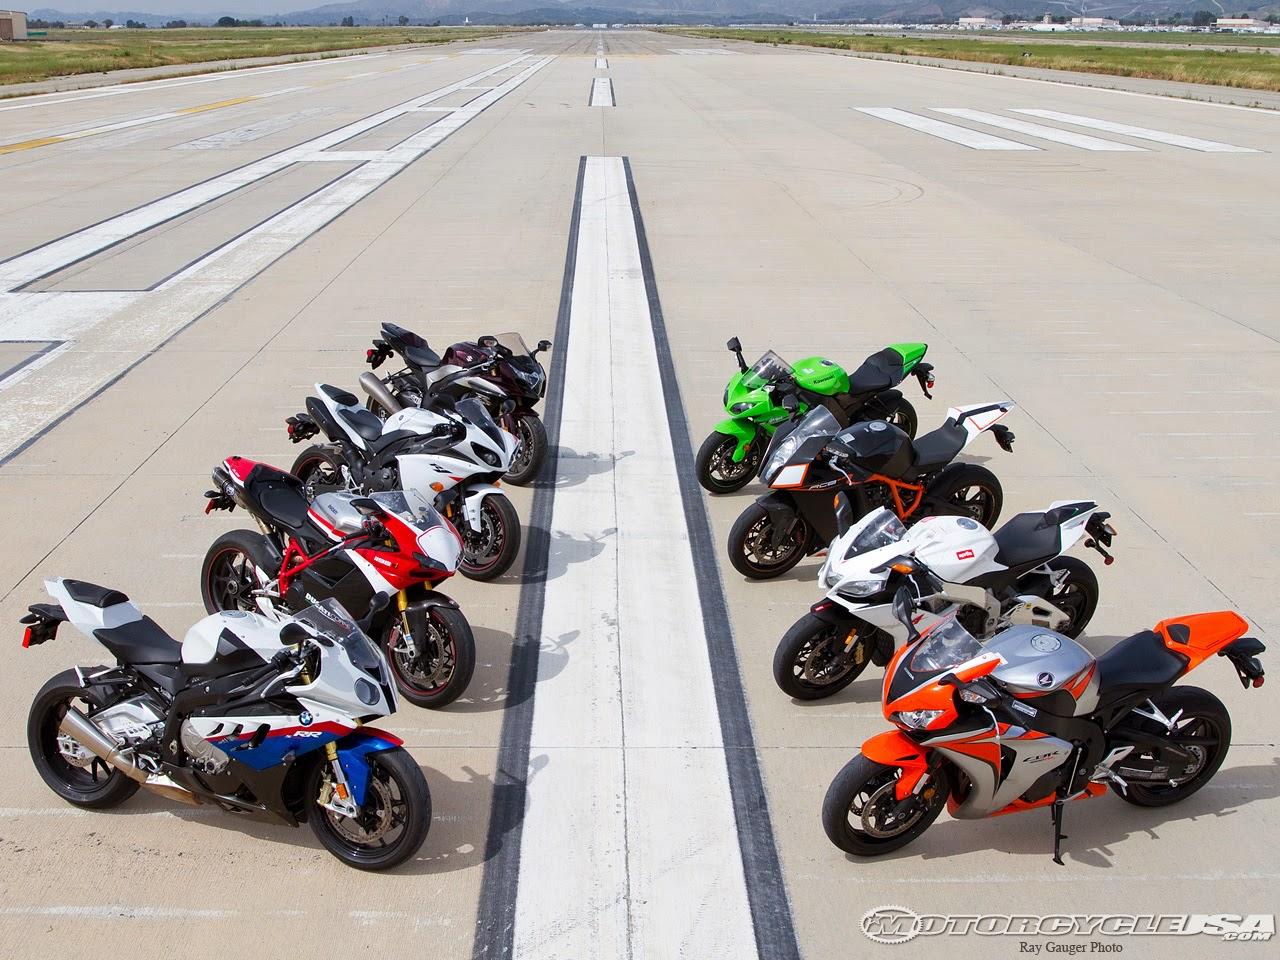 All-BMW-S1000RR-Superbike-HD-Wallpaper